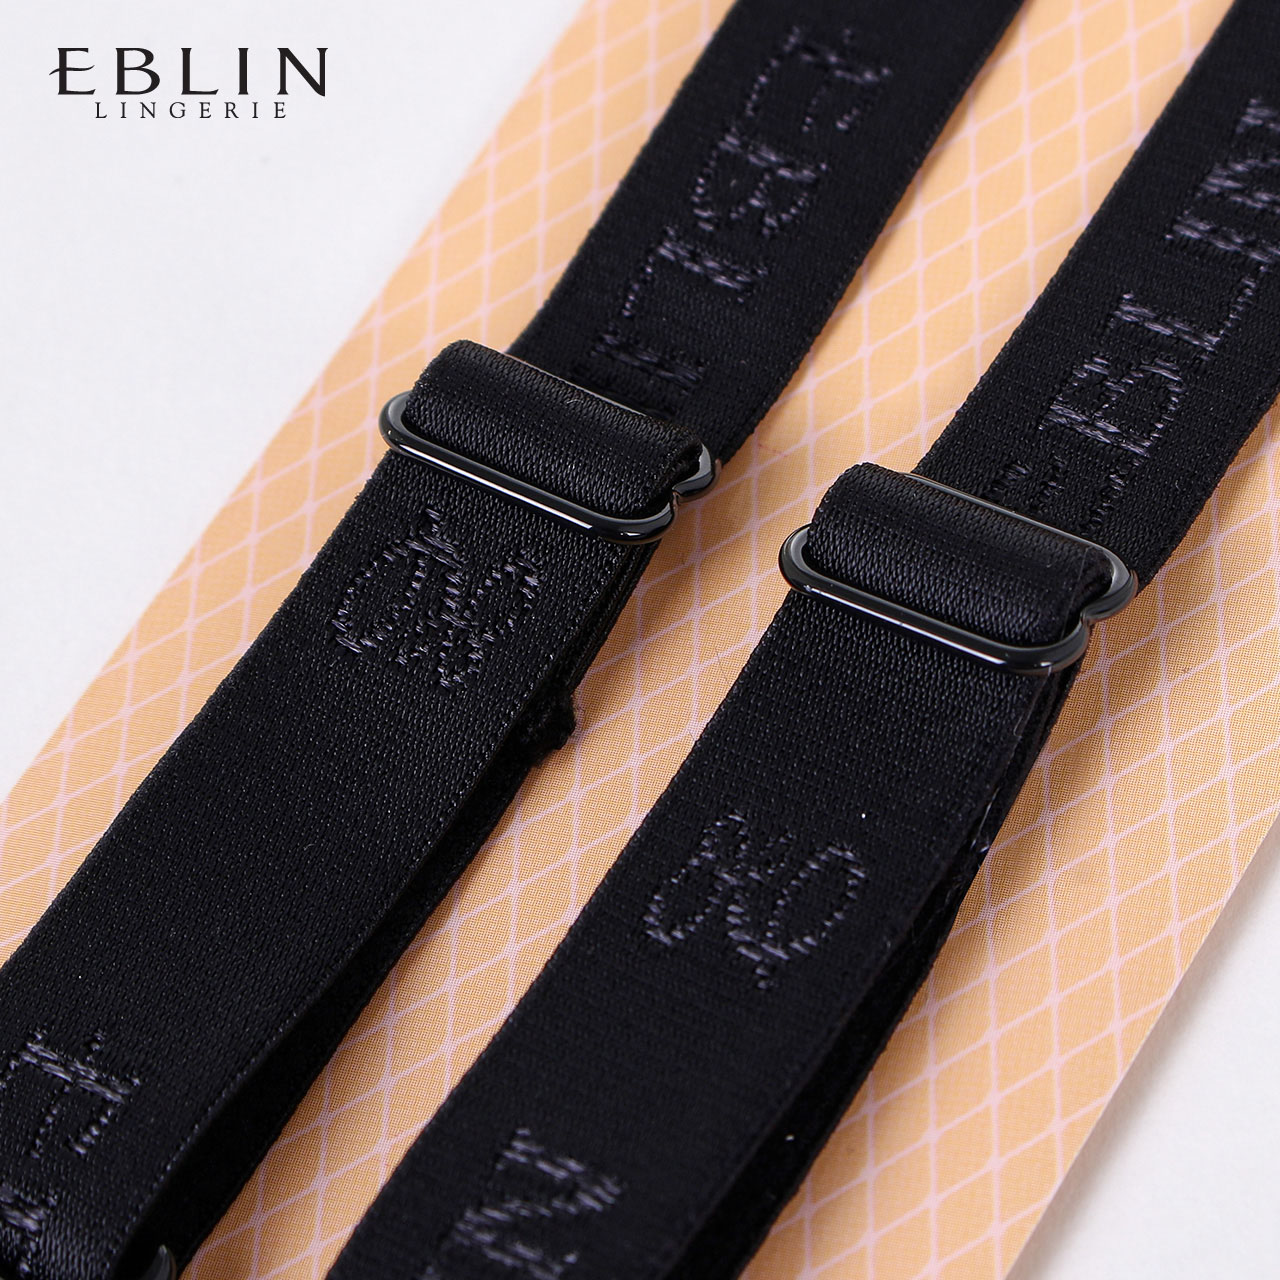 EBLIN配件配饰文胸肩带女士肩带ECAX789A11